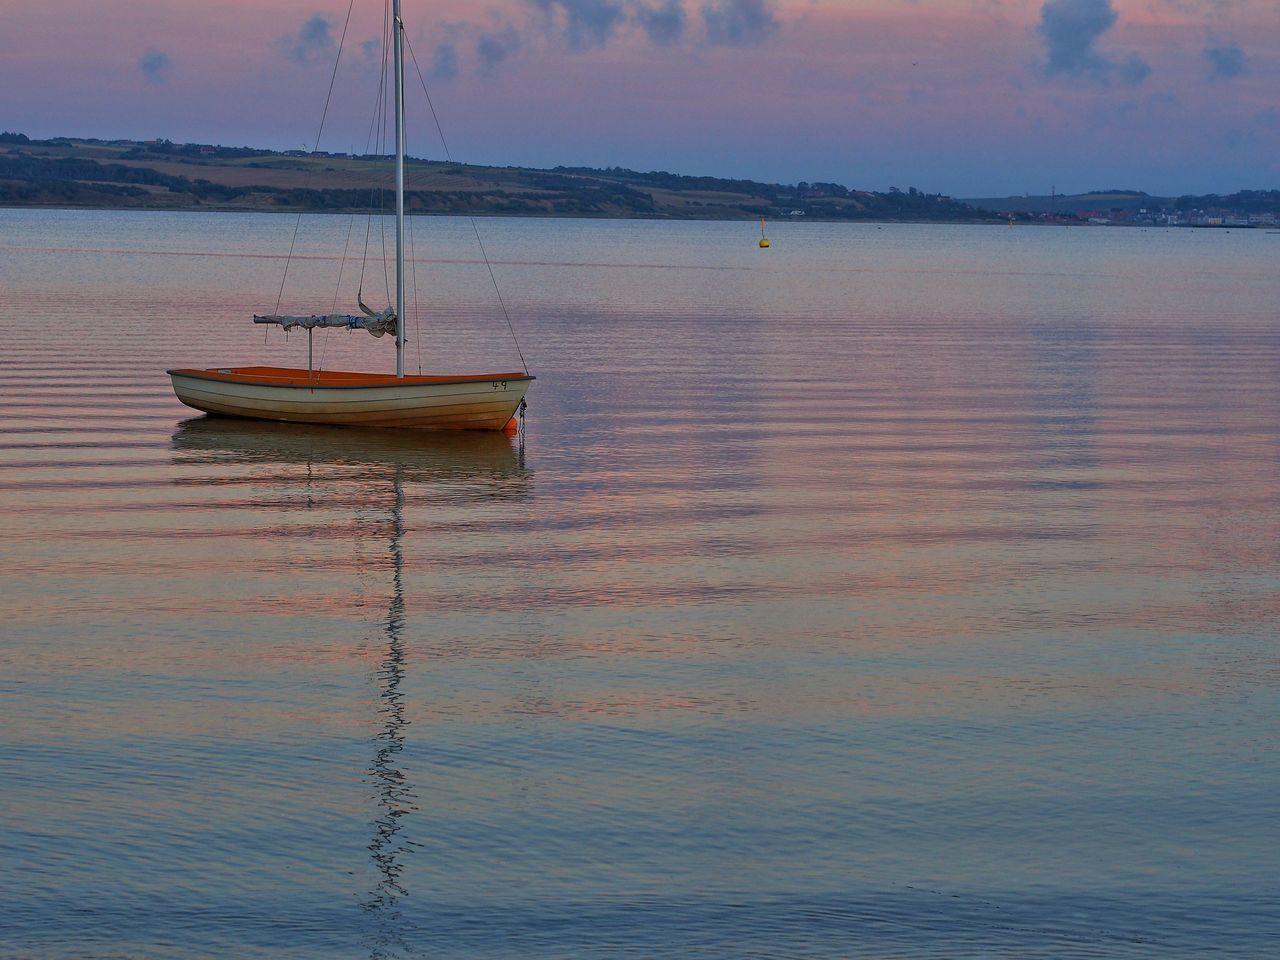 Lemvig Gjellerodde Colors Boat Water Landscape Sunset M.Zuiko 45mm 1:1,8 Midtjylland Jylland